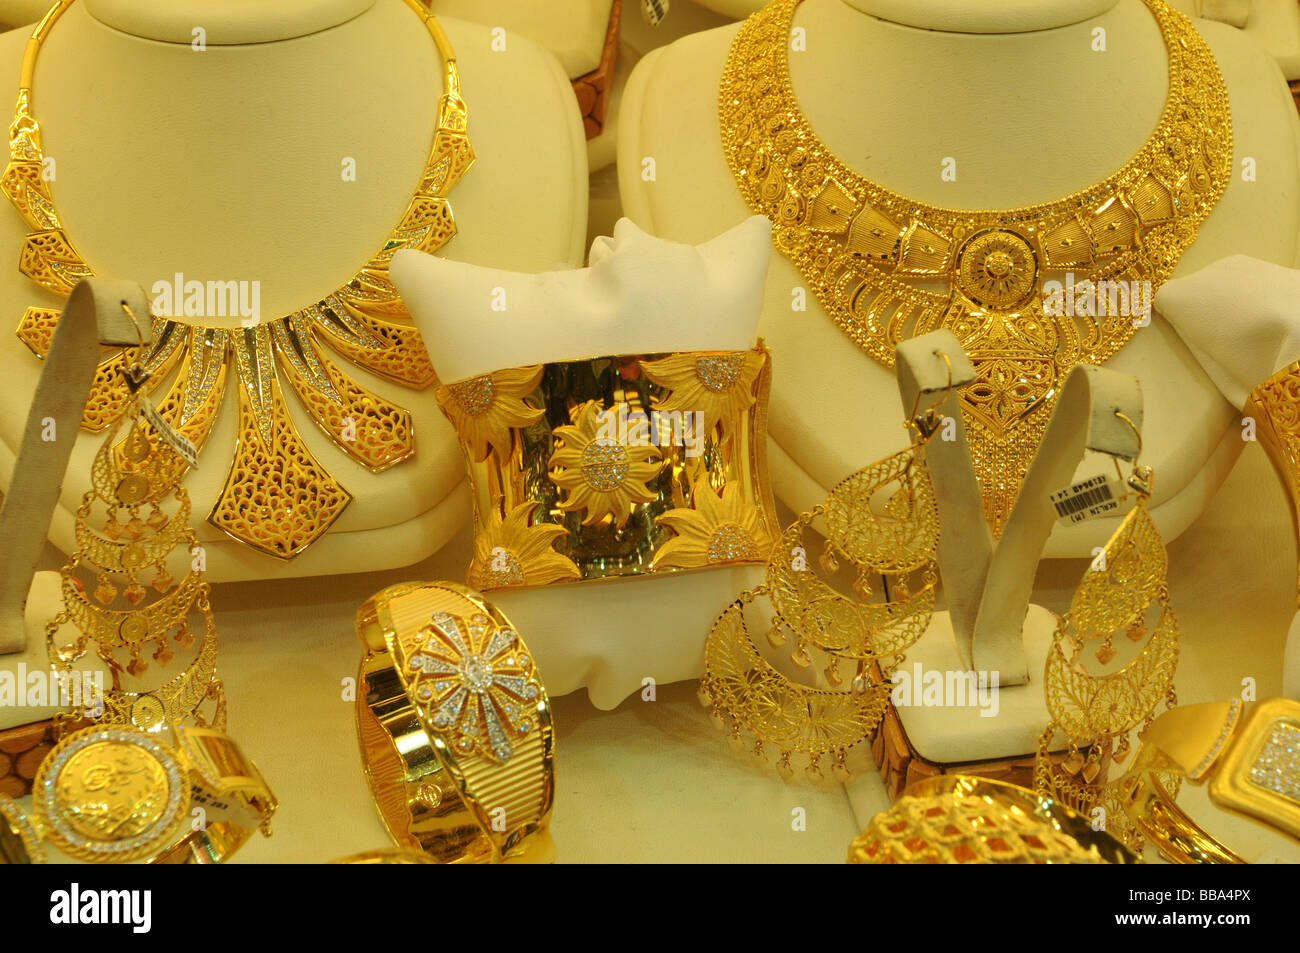 Istanbul Gold Jewelry Jewellery Stock Photos Istanbul Gold Jewelry